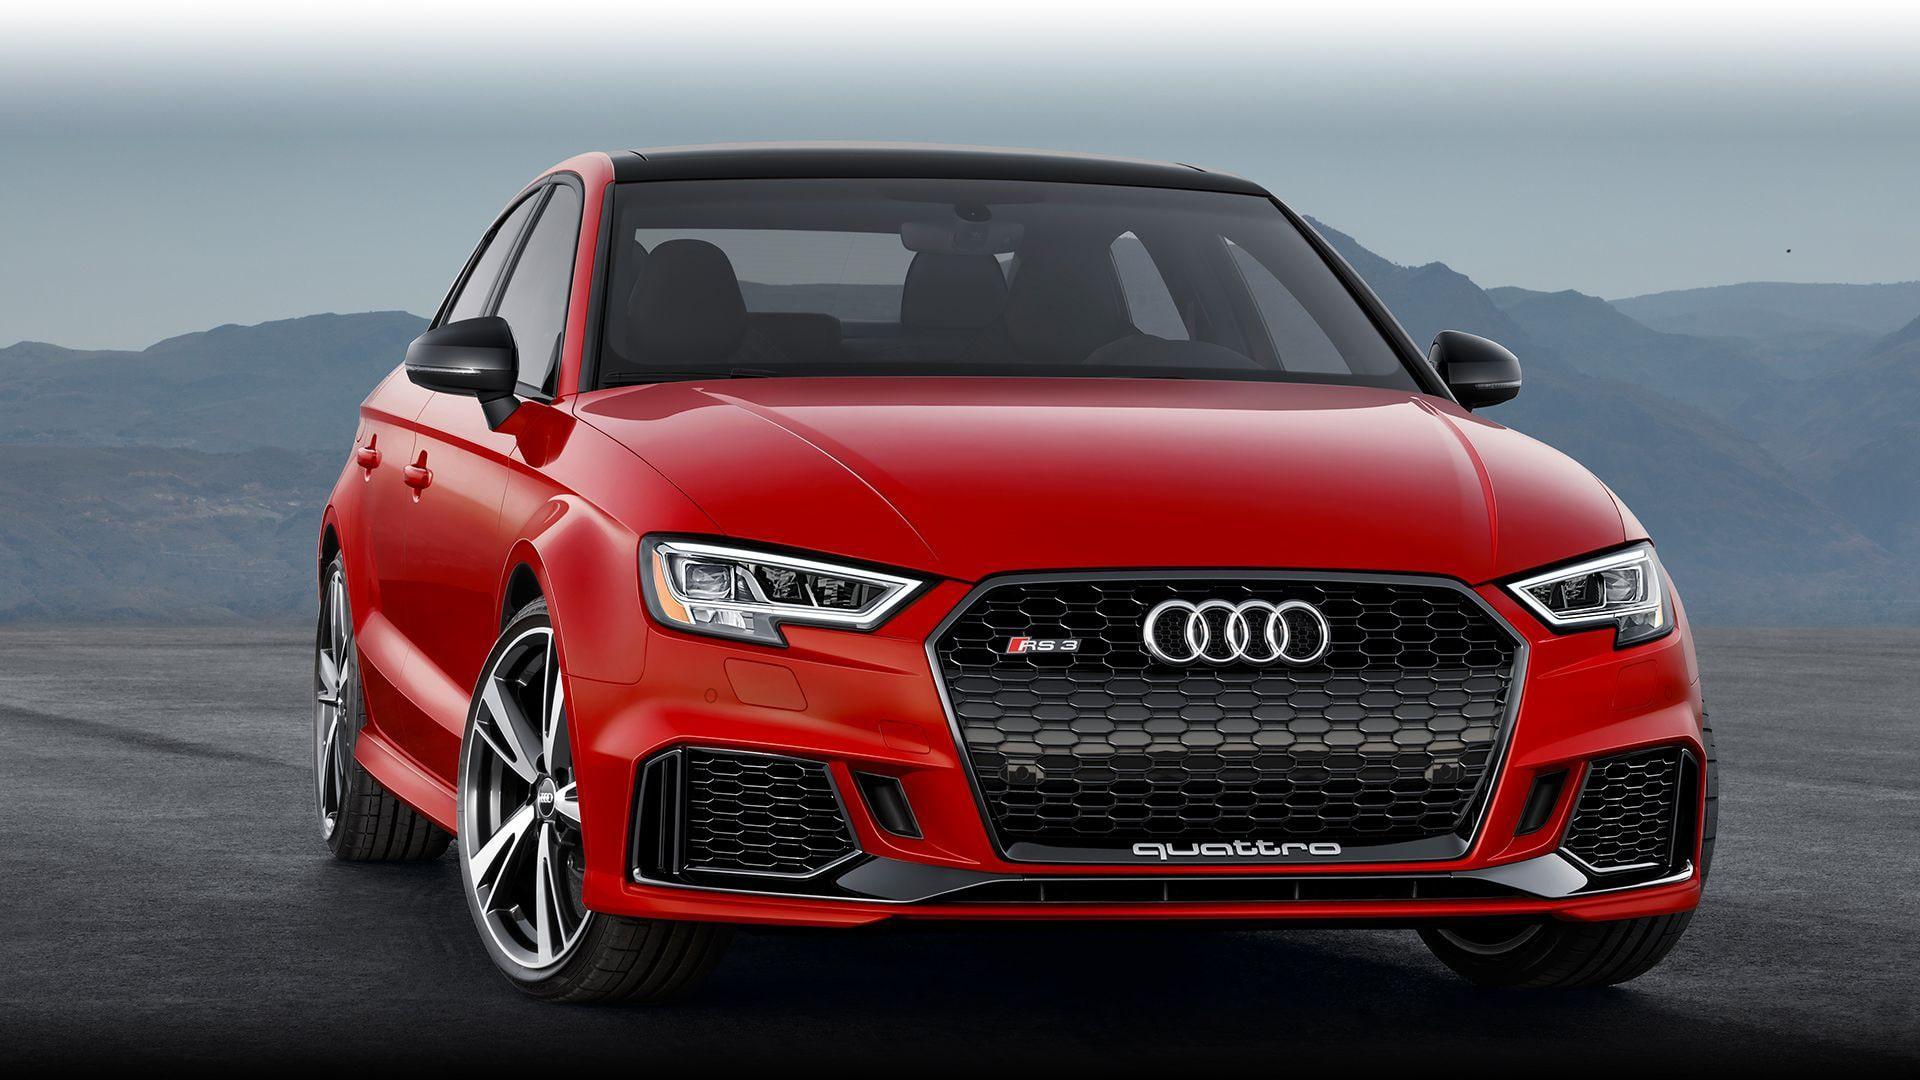 2020 Audi RS3   Standard quattro® all-wheel drive   Audi USA